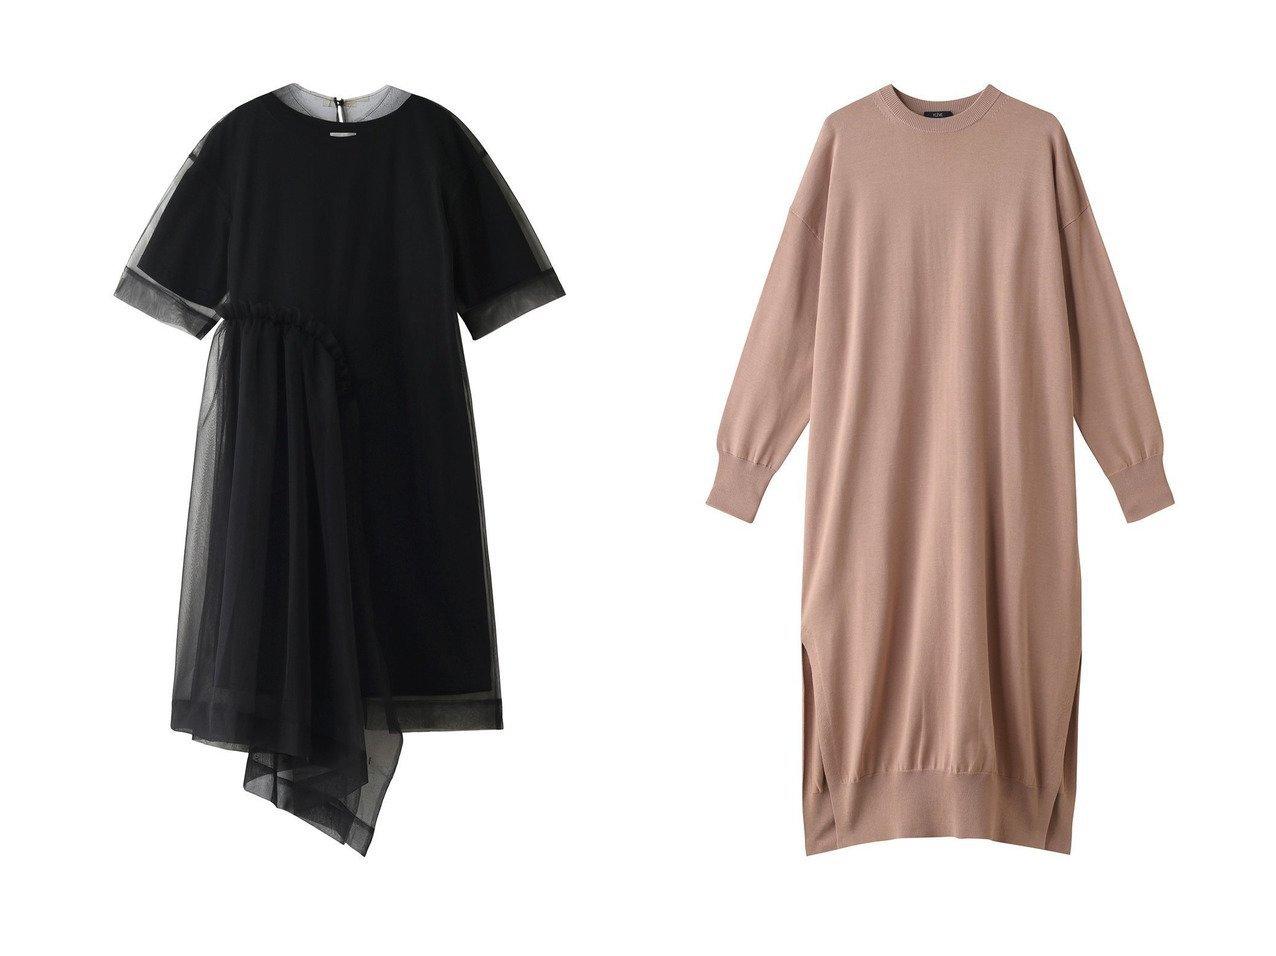 【YLEVE/イレーヴ】のオーガニックピマコットンニットワンピース&【REKISAMI/レキサミ】の【Chika Kisada】チュールレイヤードワンピース ワンピース・ドレスのおすすめ!人気、トレンド・レディースファッションの通販 おすすめで人気の流行・トレンド、ファッションの通販商品 メンズファッション・キッズファッション・インテリア・家具・レディースファッション・服の通販 founy(ファニー) https://founy.com/ ファッション Fashion レディースファッション WOMEN ワンピース Dress ニットワンピース Knit Dresses 2021年 2021 2021 春夏 S/S SS Spring/Summer 2021 S/S 春夏 SS Spring/Summer シンプル スリット ロング 春 Spring |ID:crp329100000013476